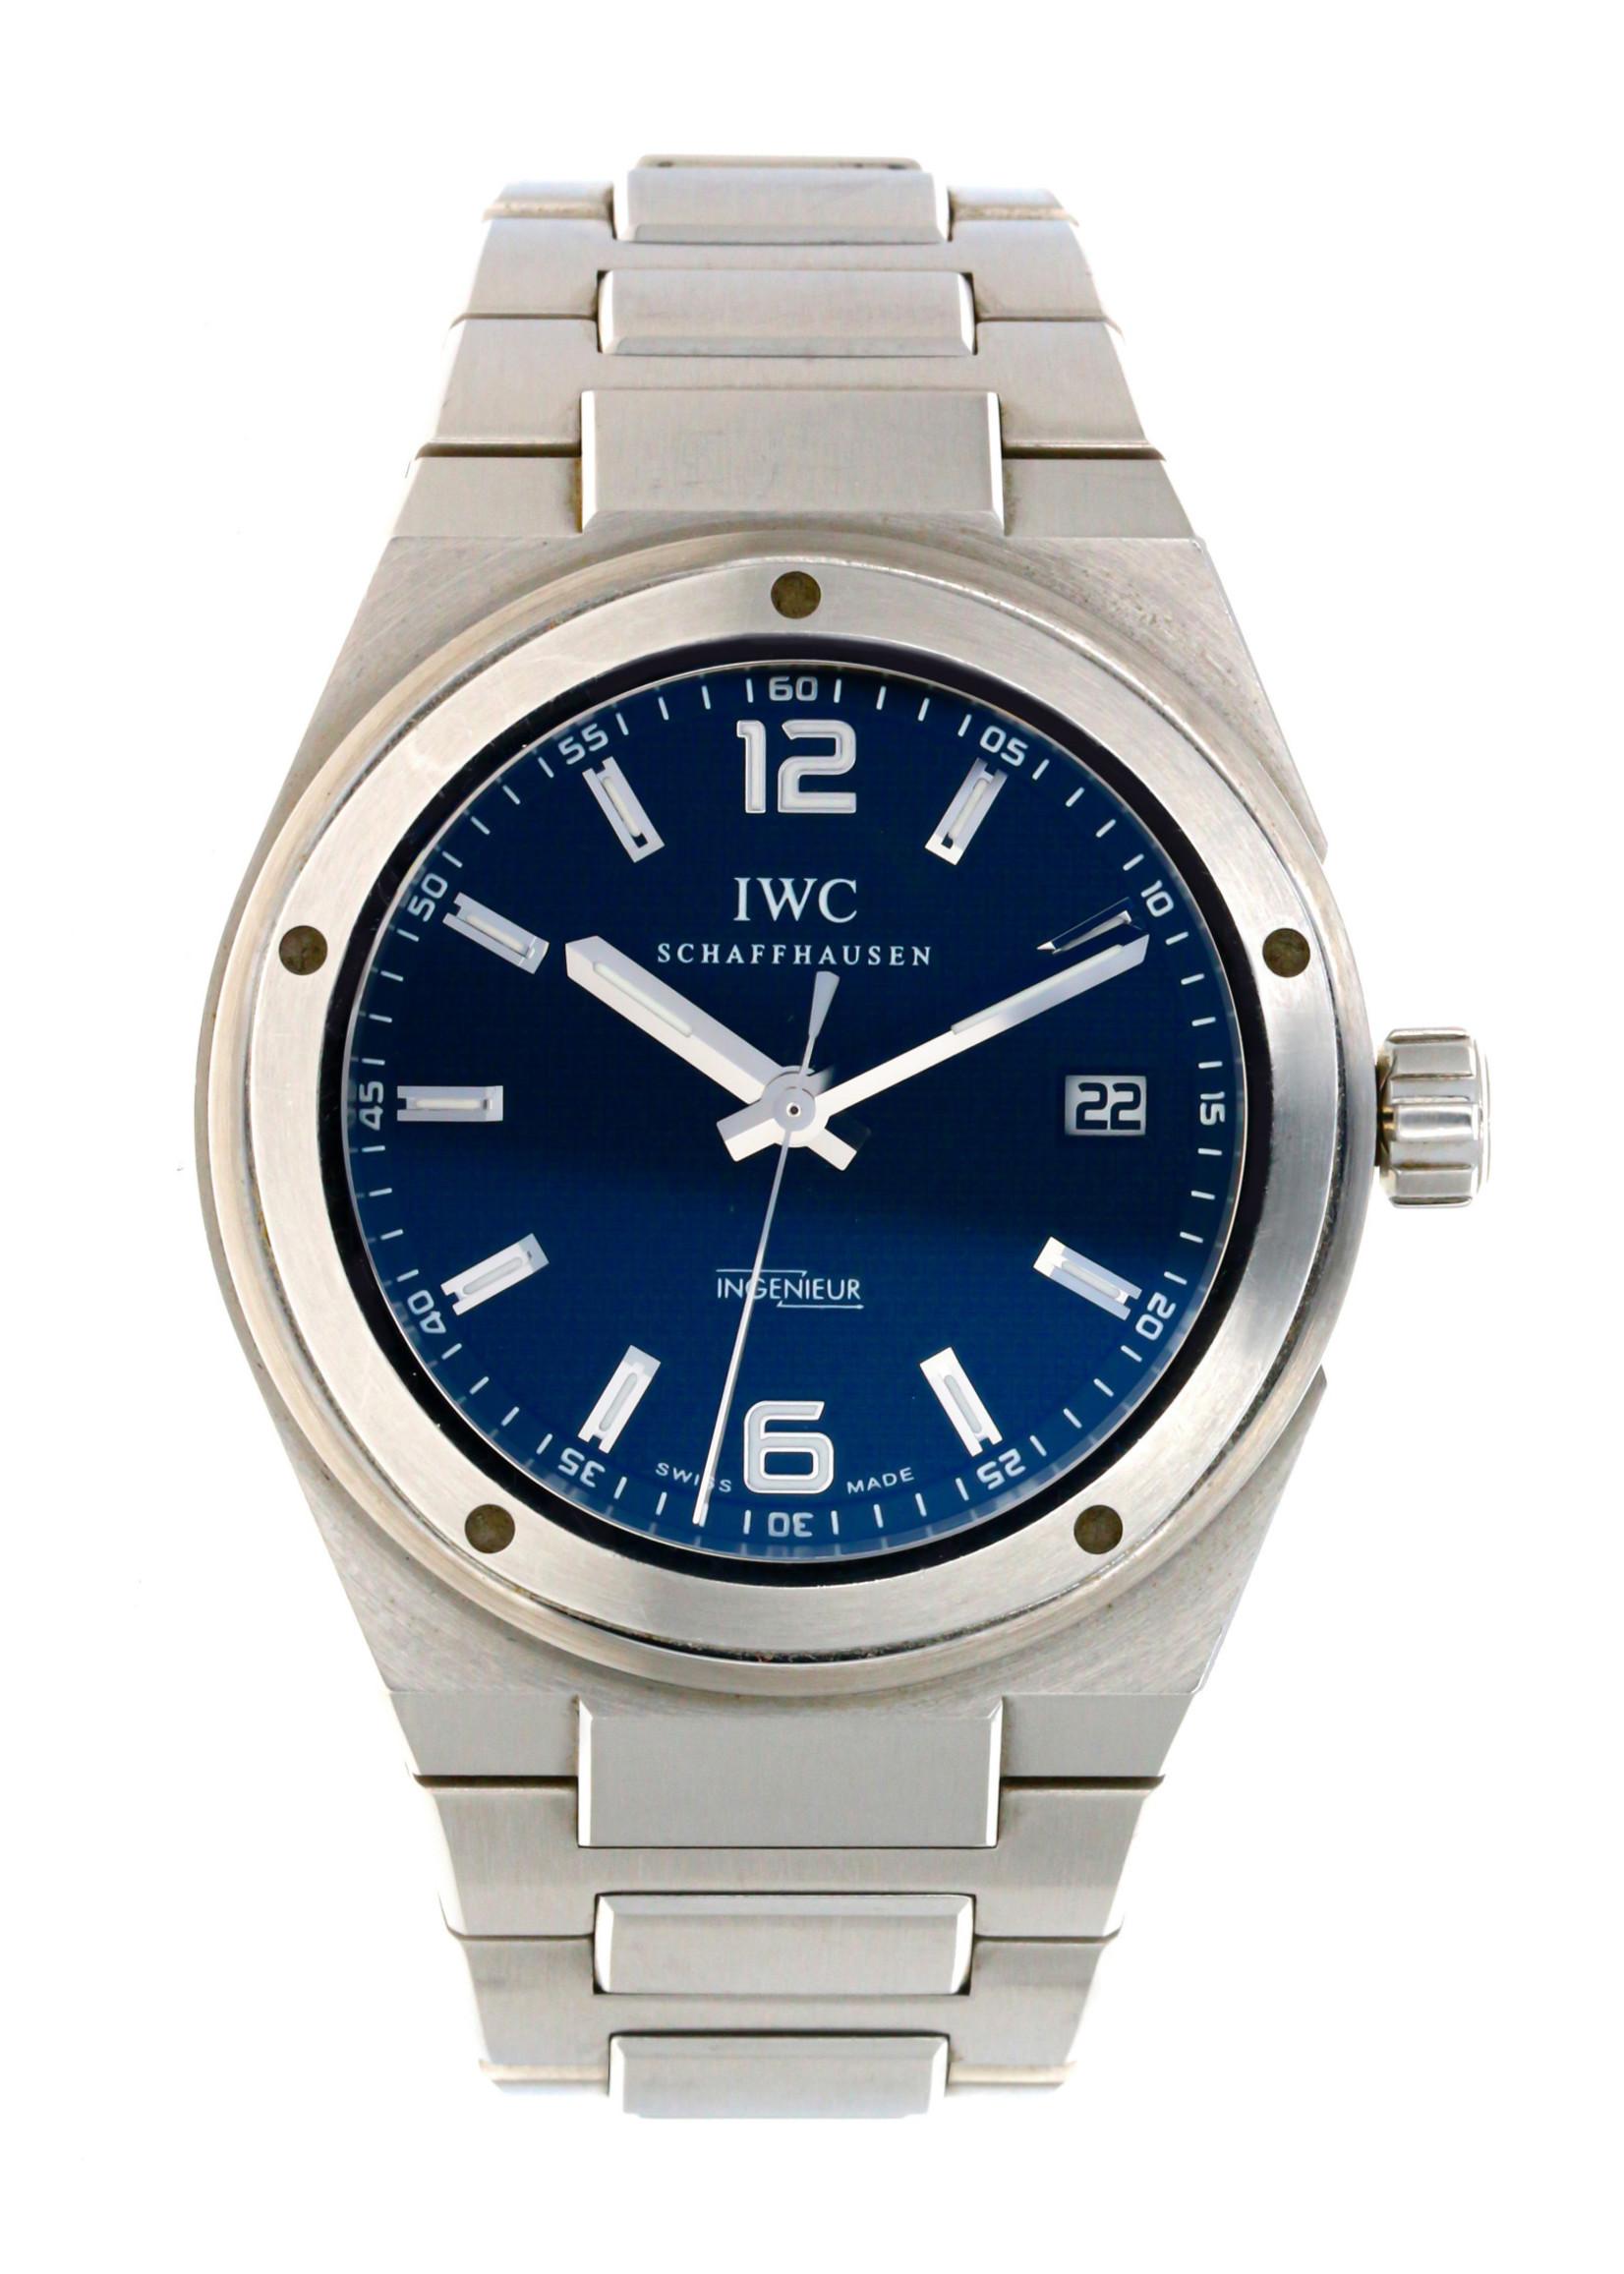 IWC IWC INGENIEUR #IW322701 42MM (2007 B+P)